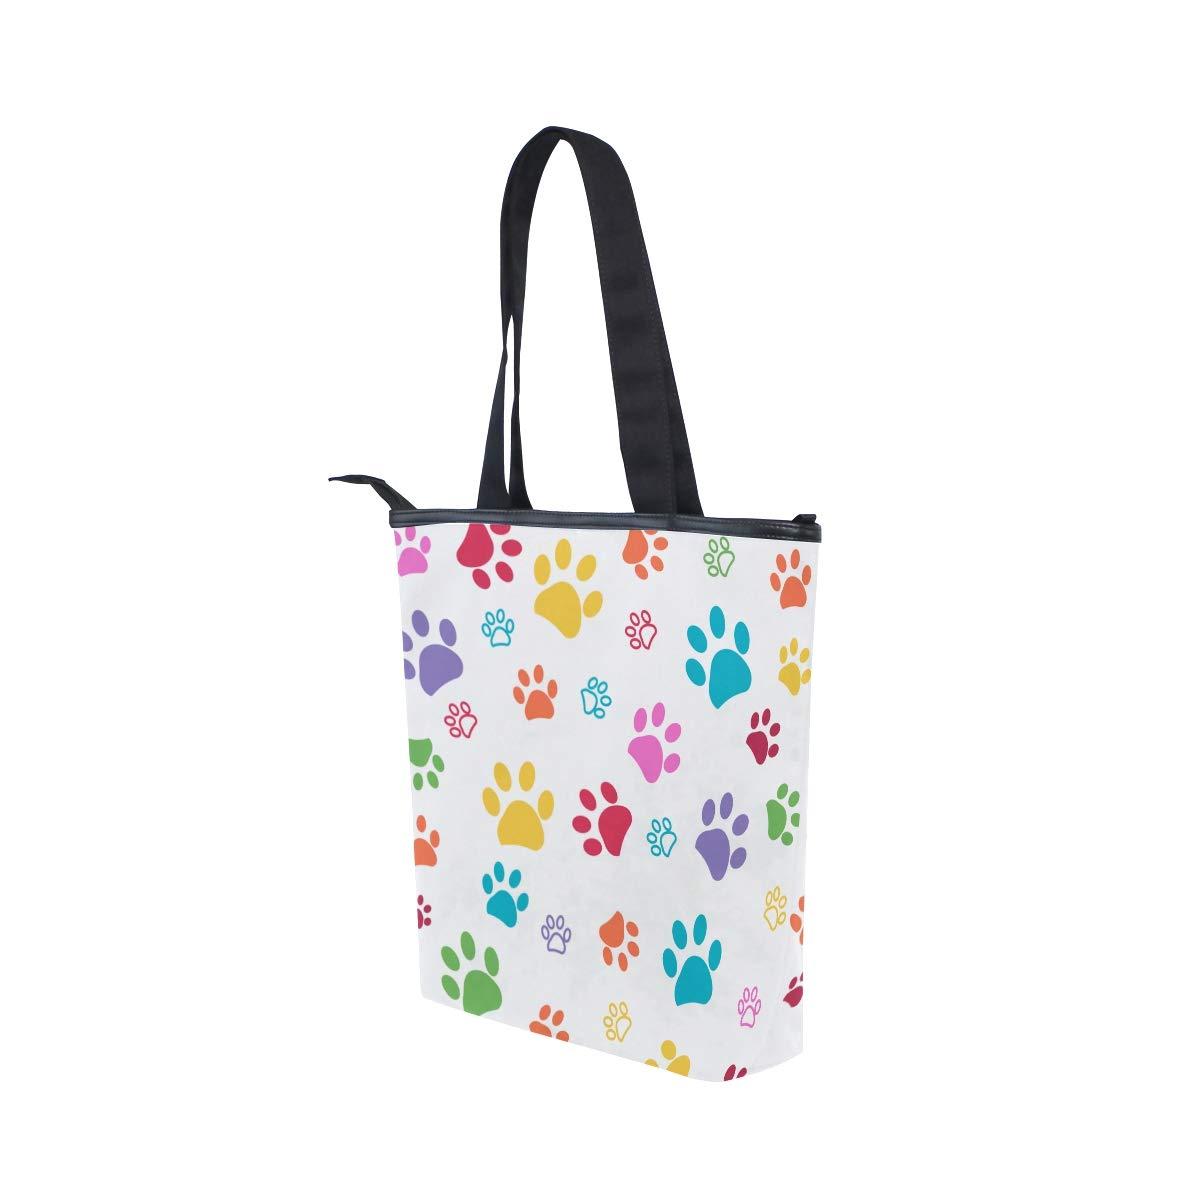 Canvas Top Handle Tote Bag Colorful Paws Shoulder Bag Handbag for Women